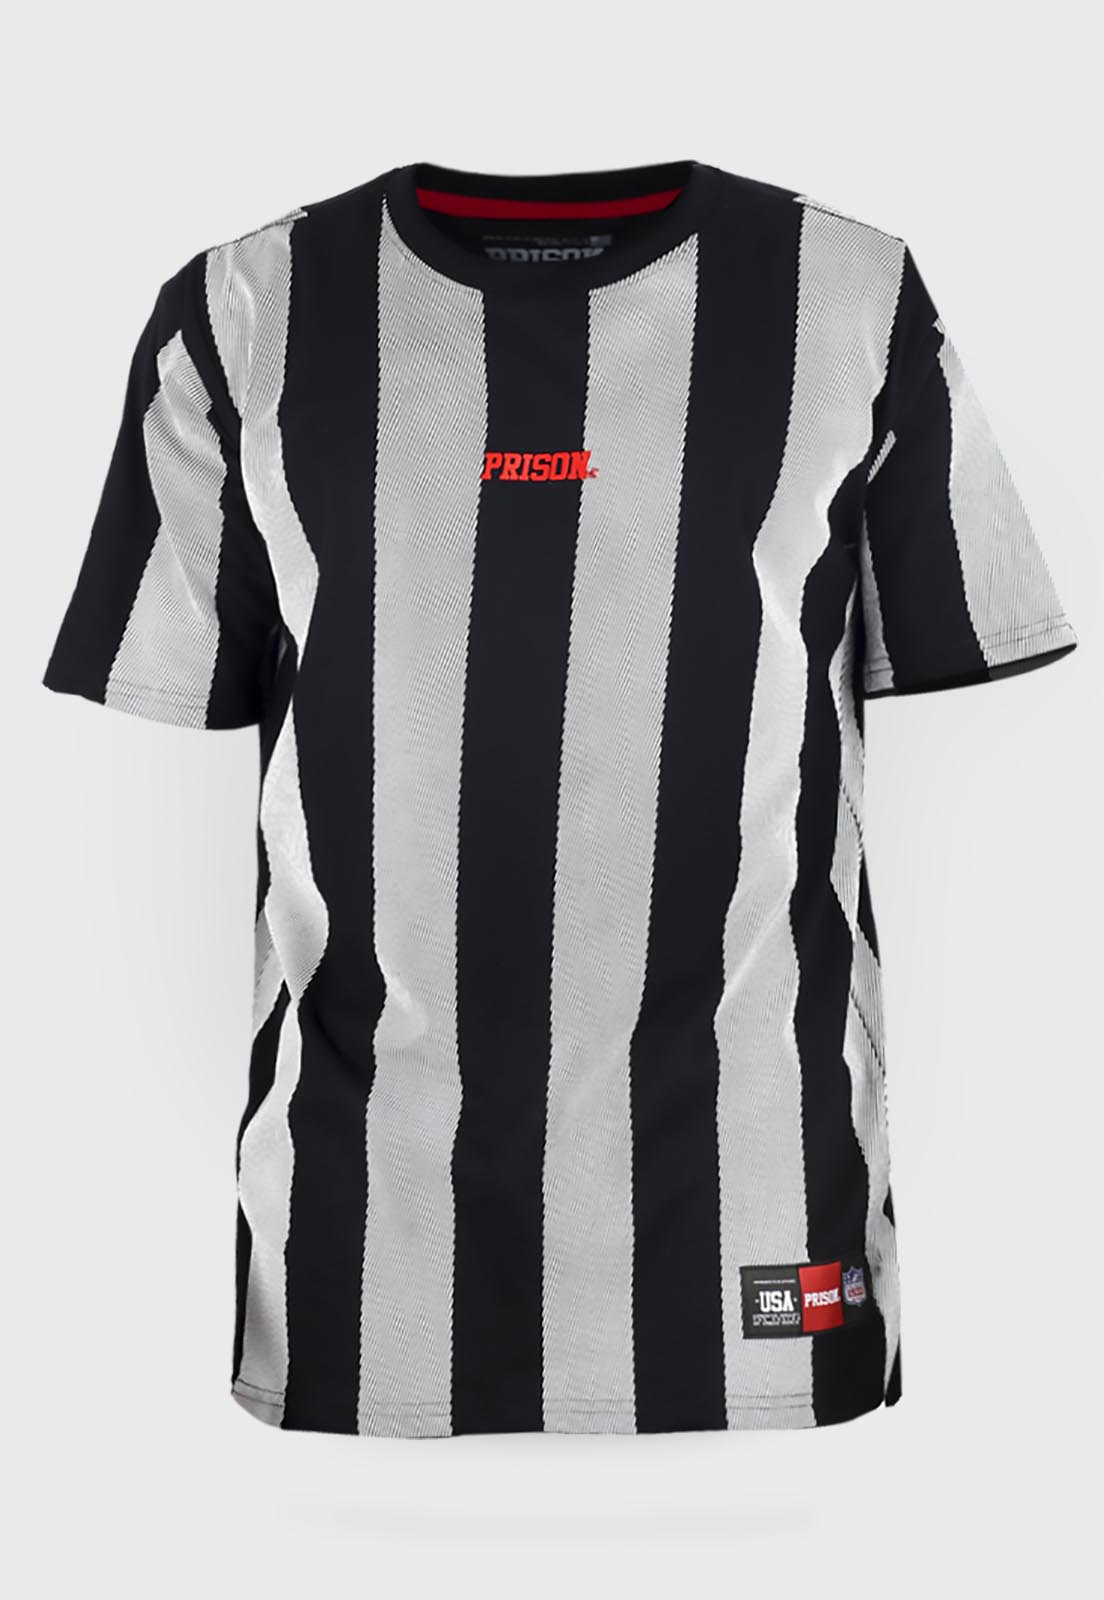 Camiseta prison streetwear Listrada Vertical